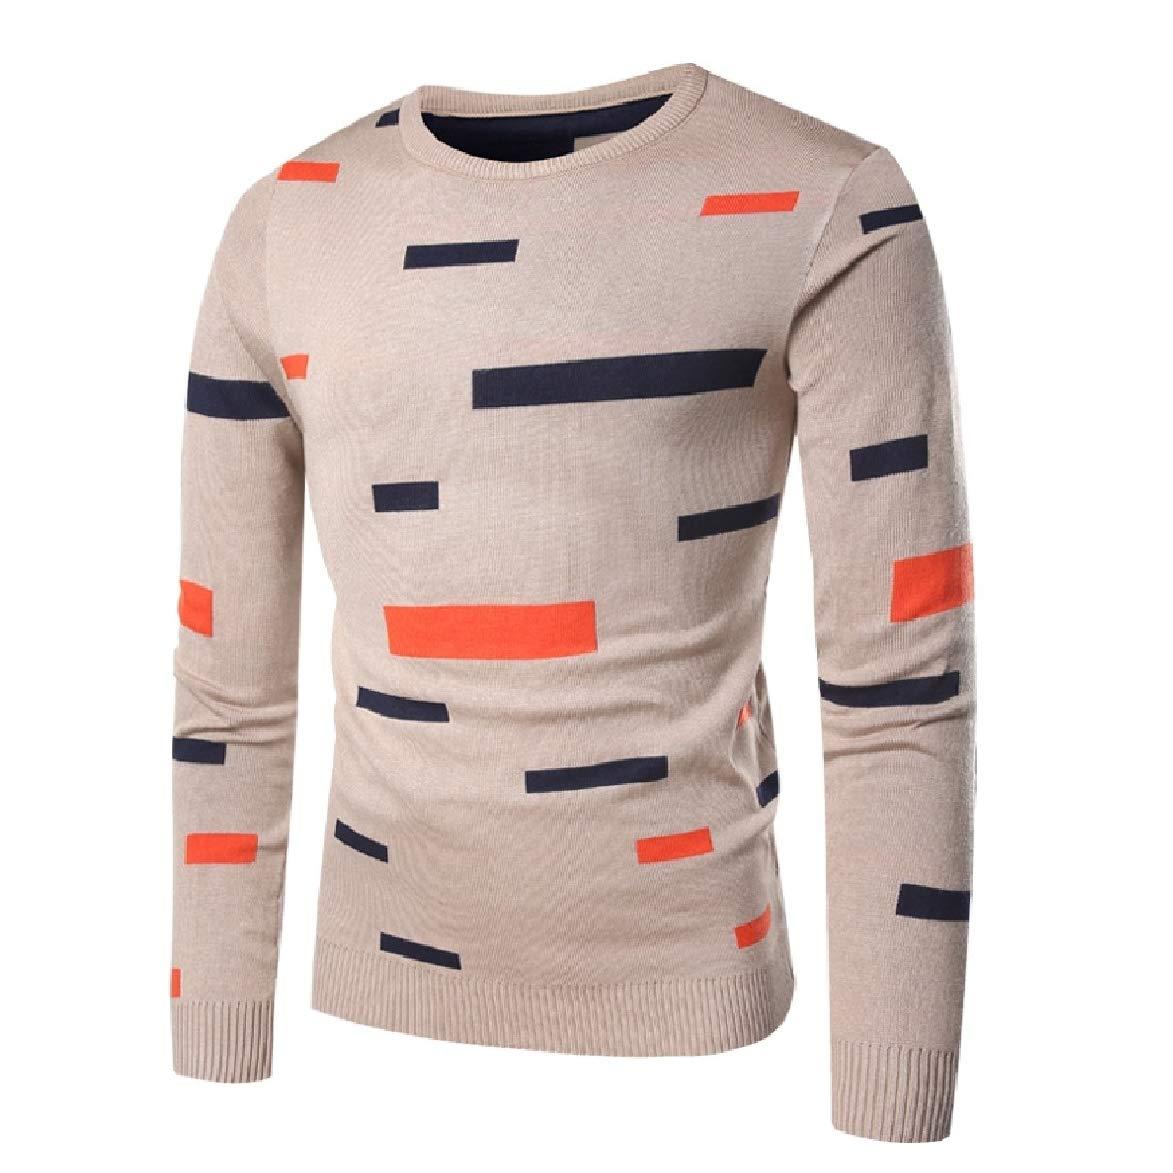 Abetteric Men Crew Neck Color Stitch Stripes Knitwear Spring//Autumn Pullover Sweater